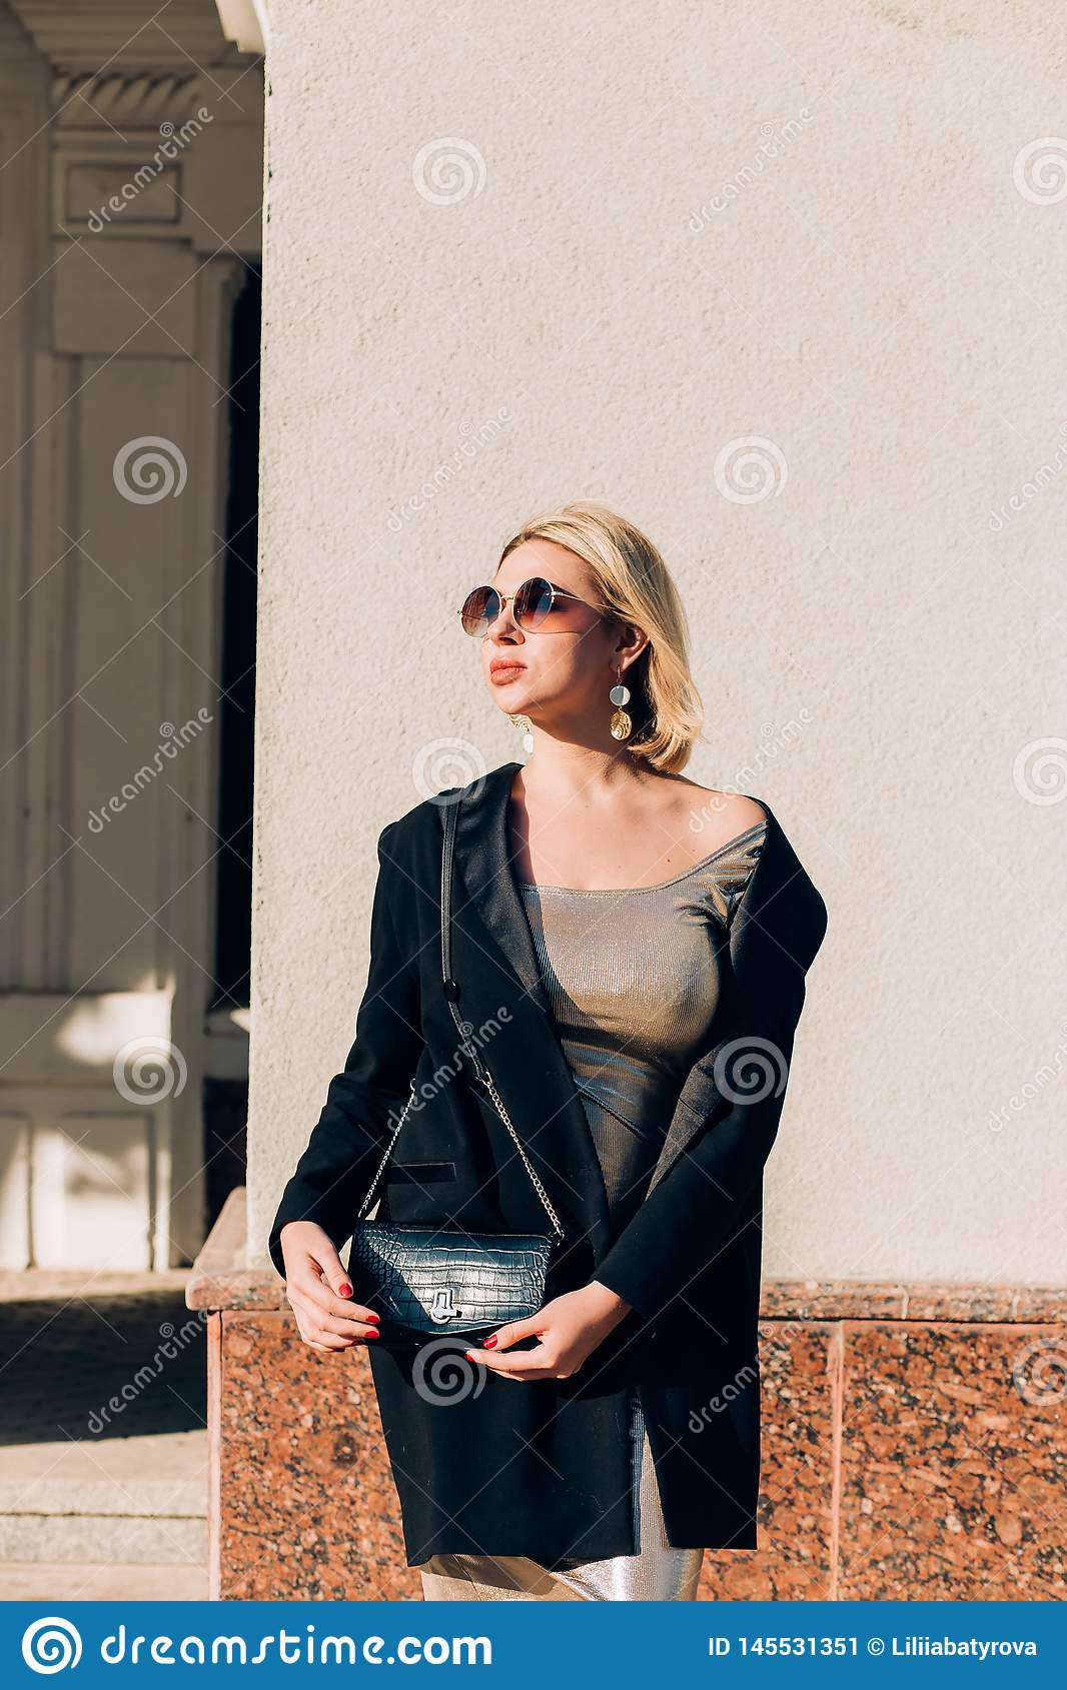 Fashionable woman on city street